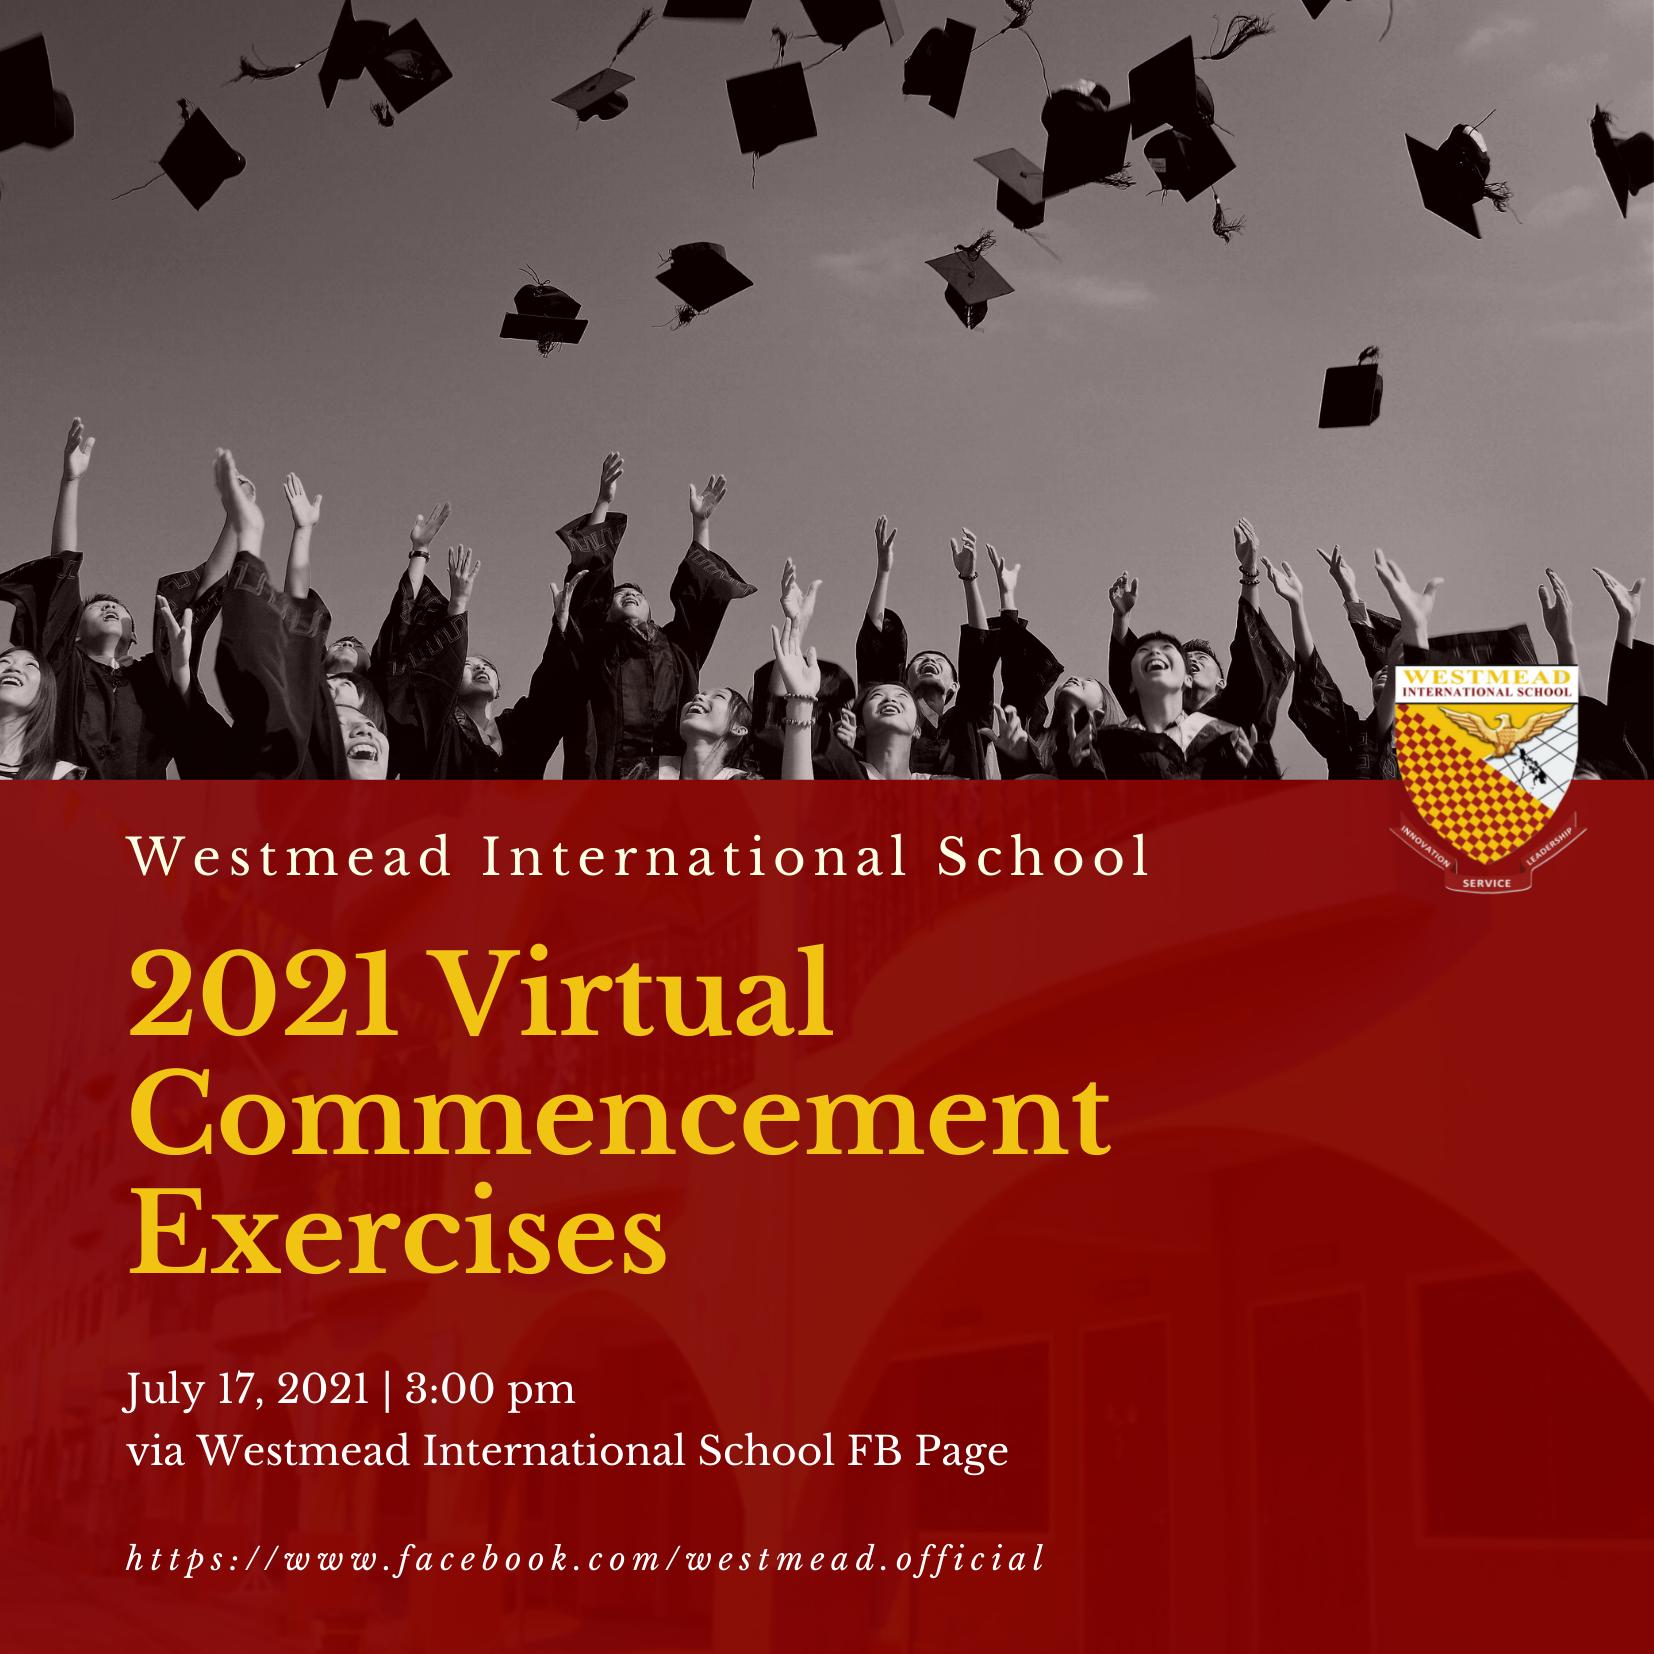 2021 Virtual Commencement Exercises